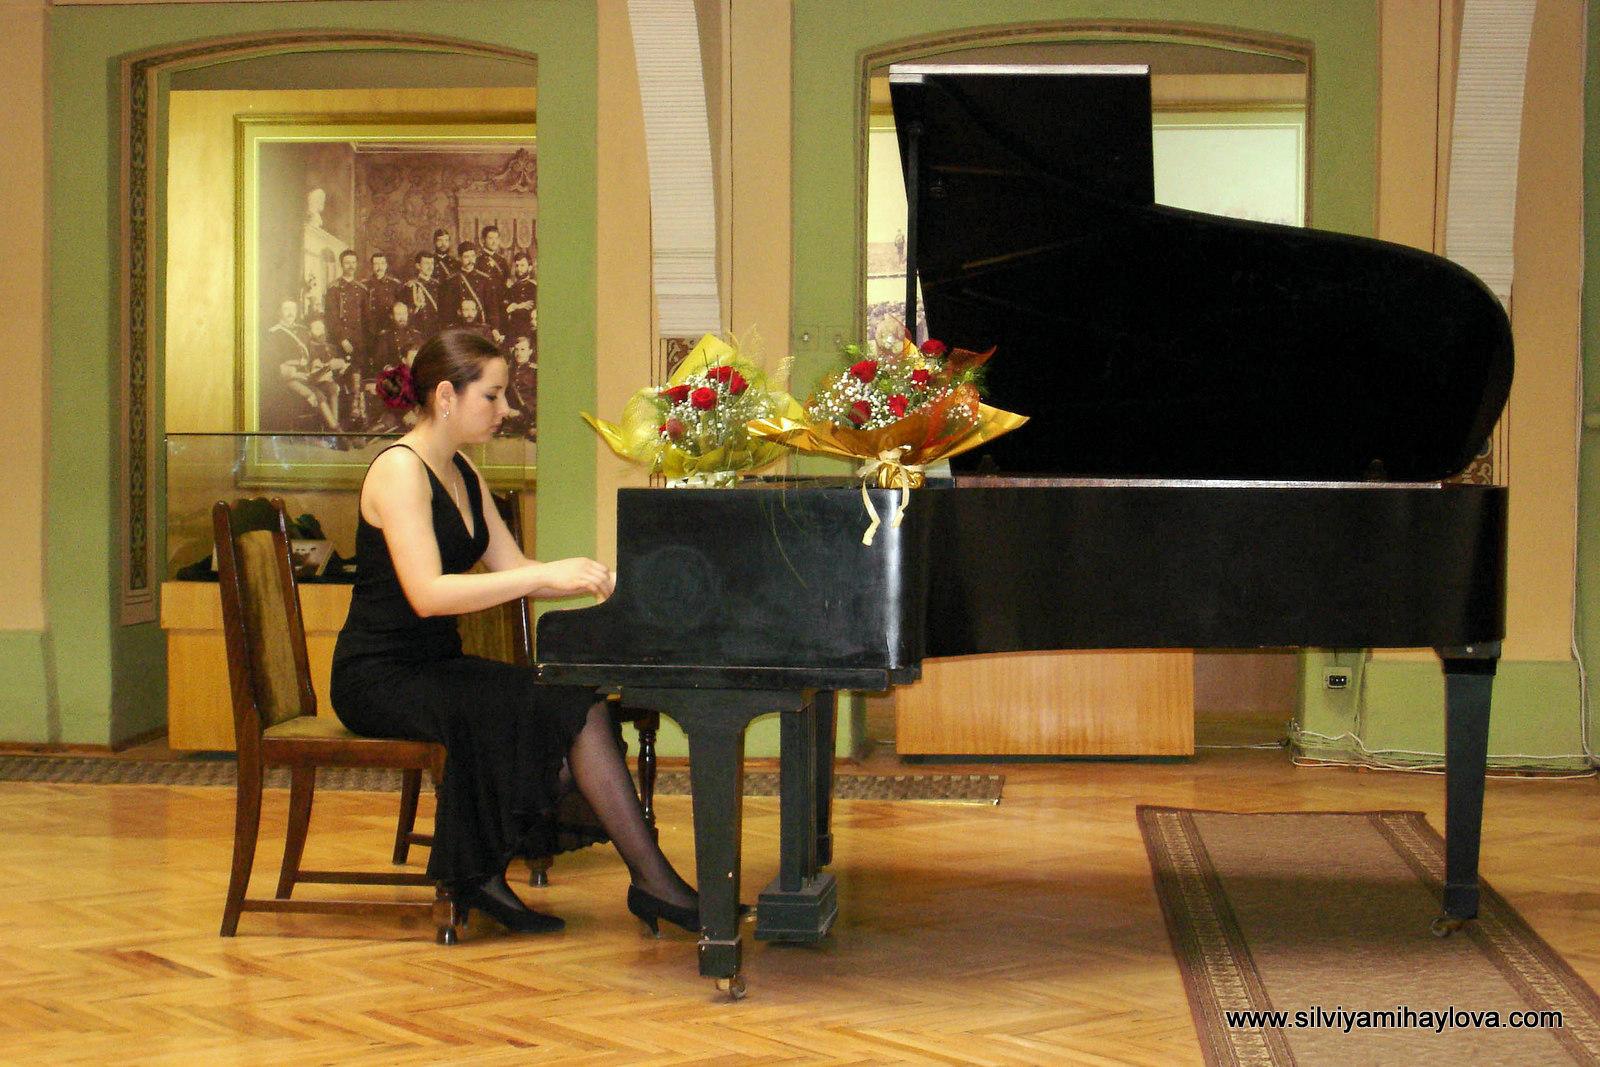 Silviya Mihaylova Concert 2006.jpg